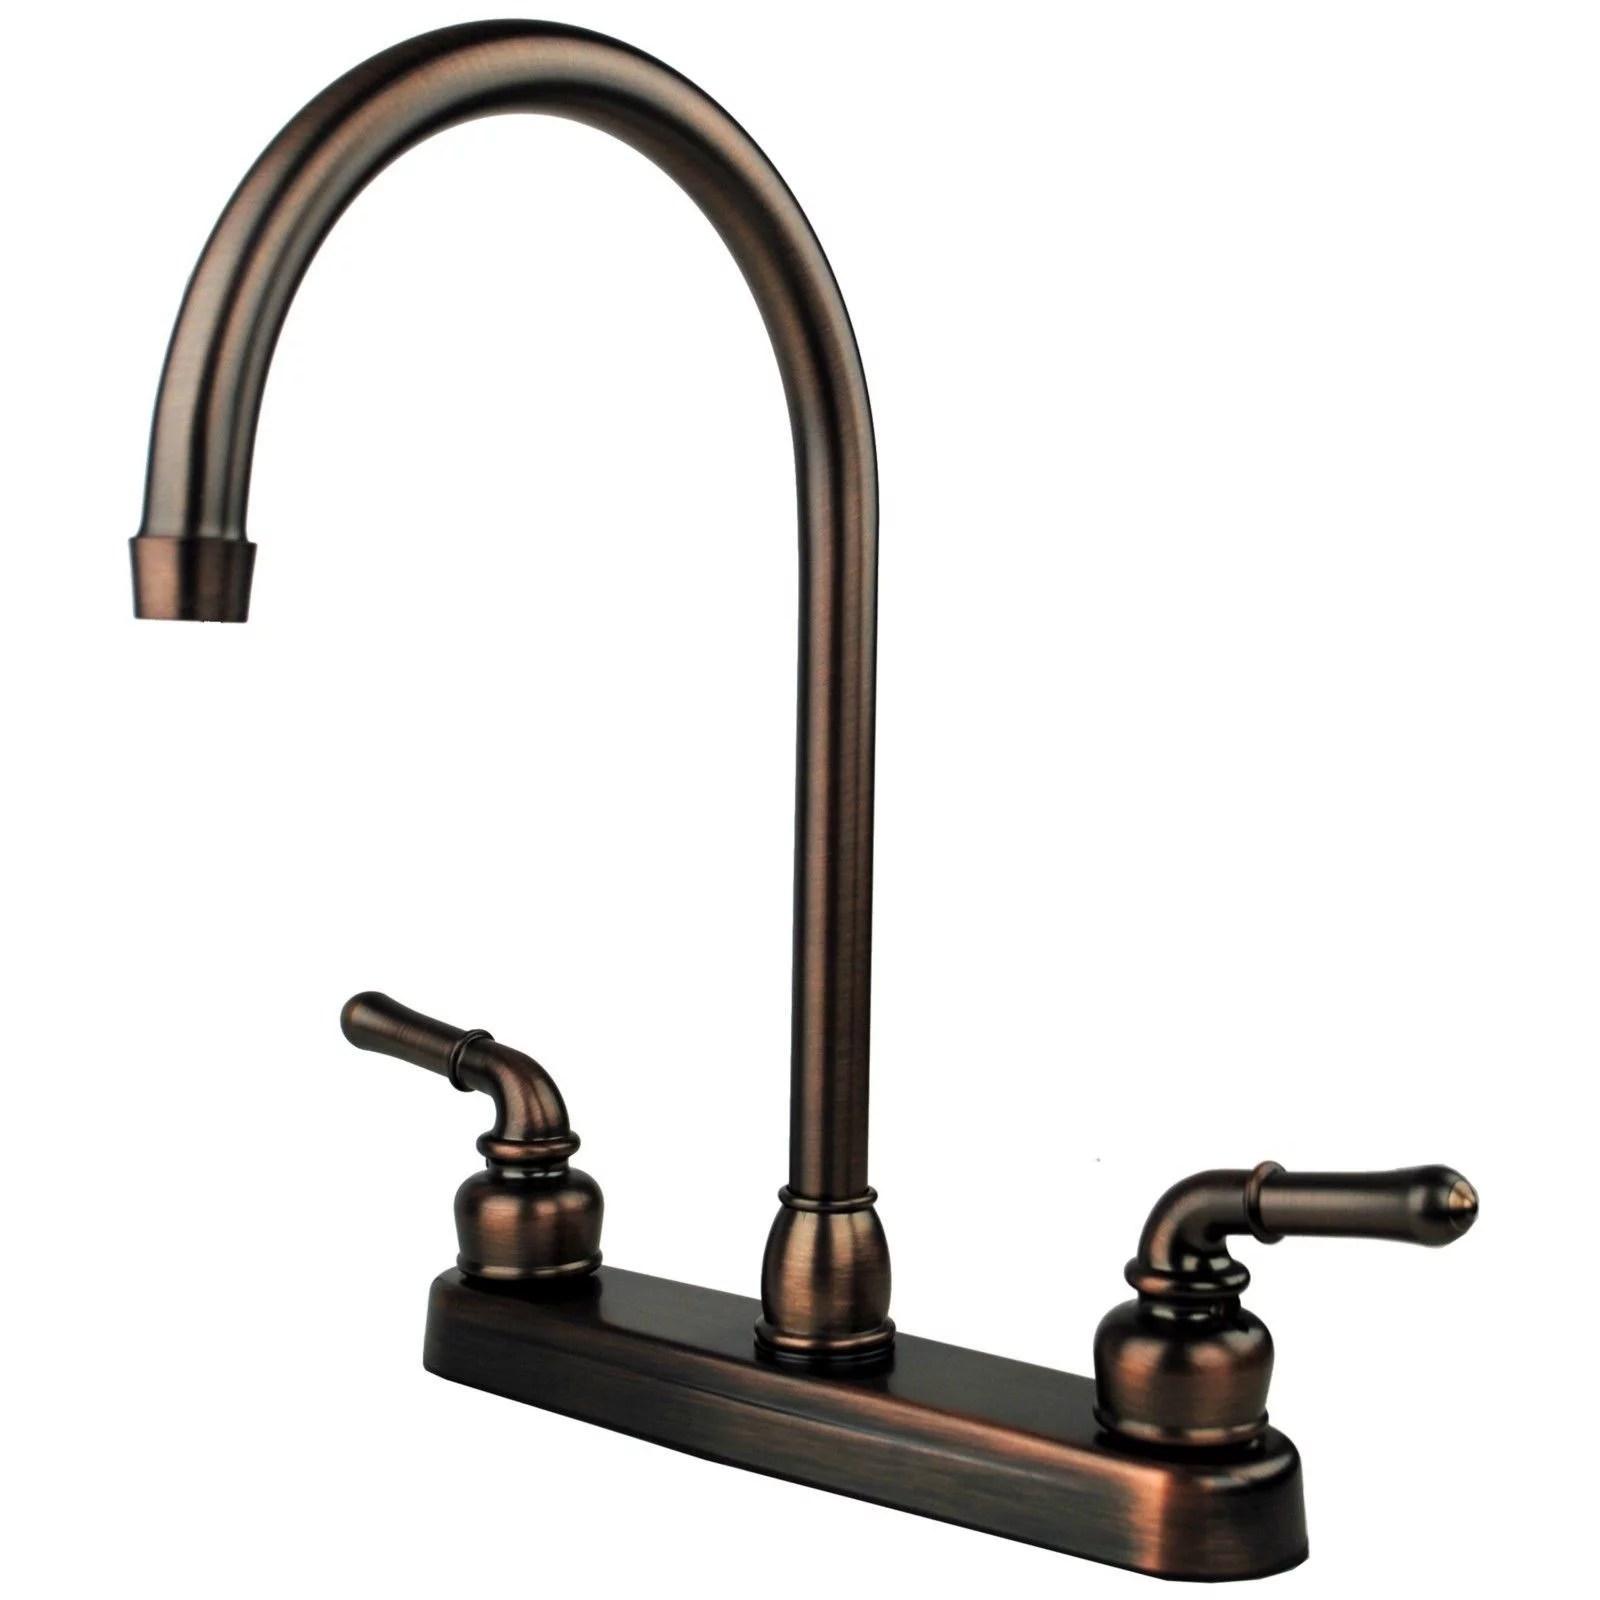 rv mobile home kitchen sink faucet 14 5 spout oil rubbed bronze